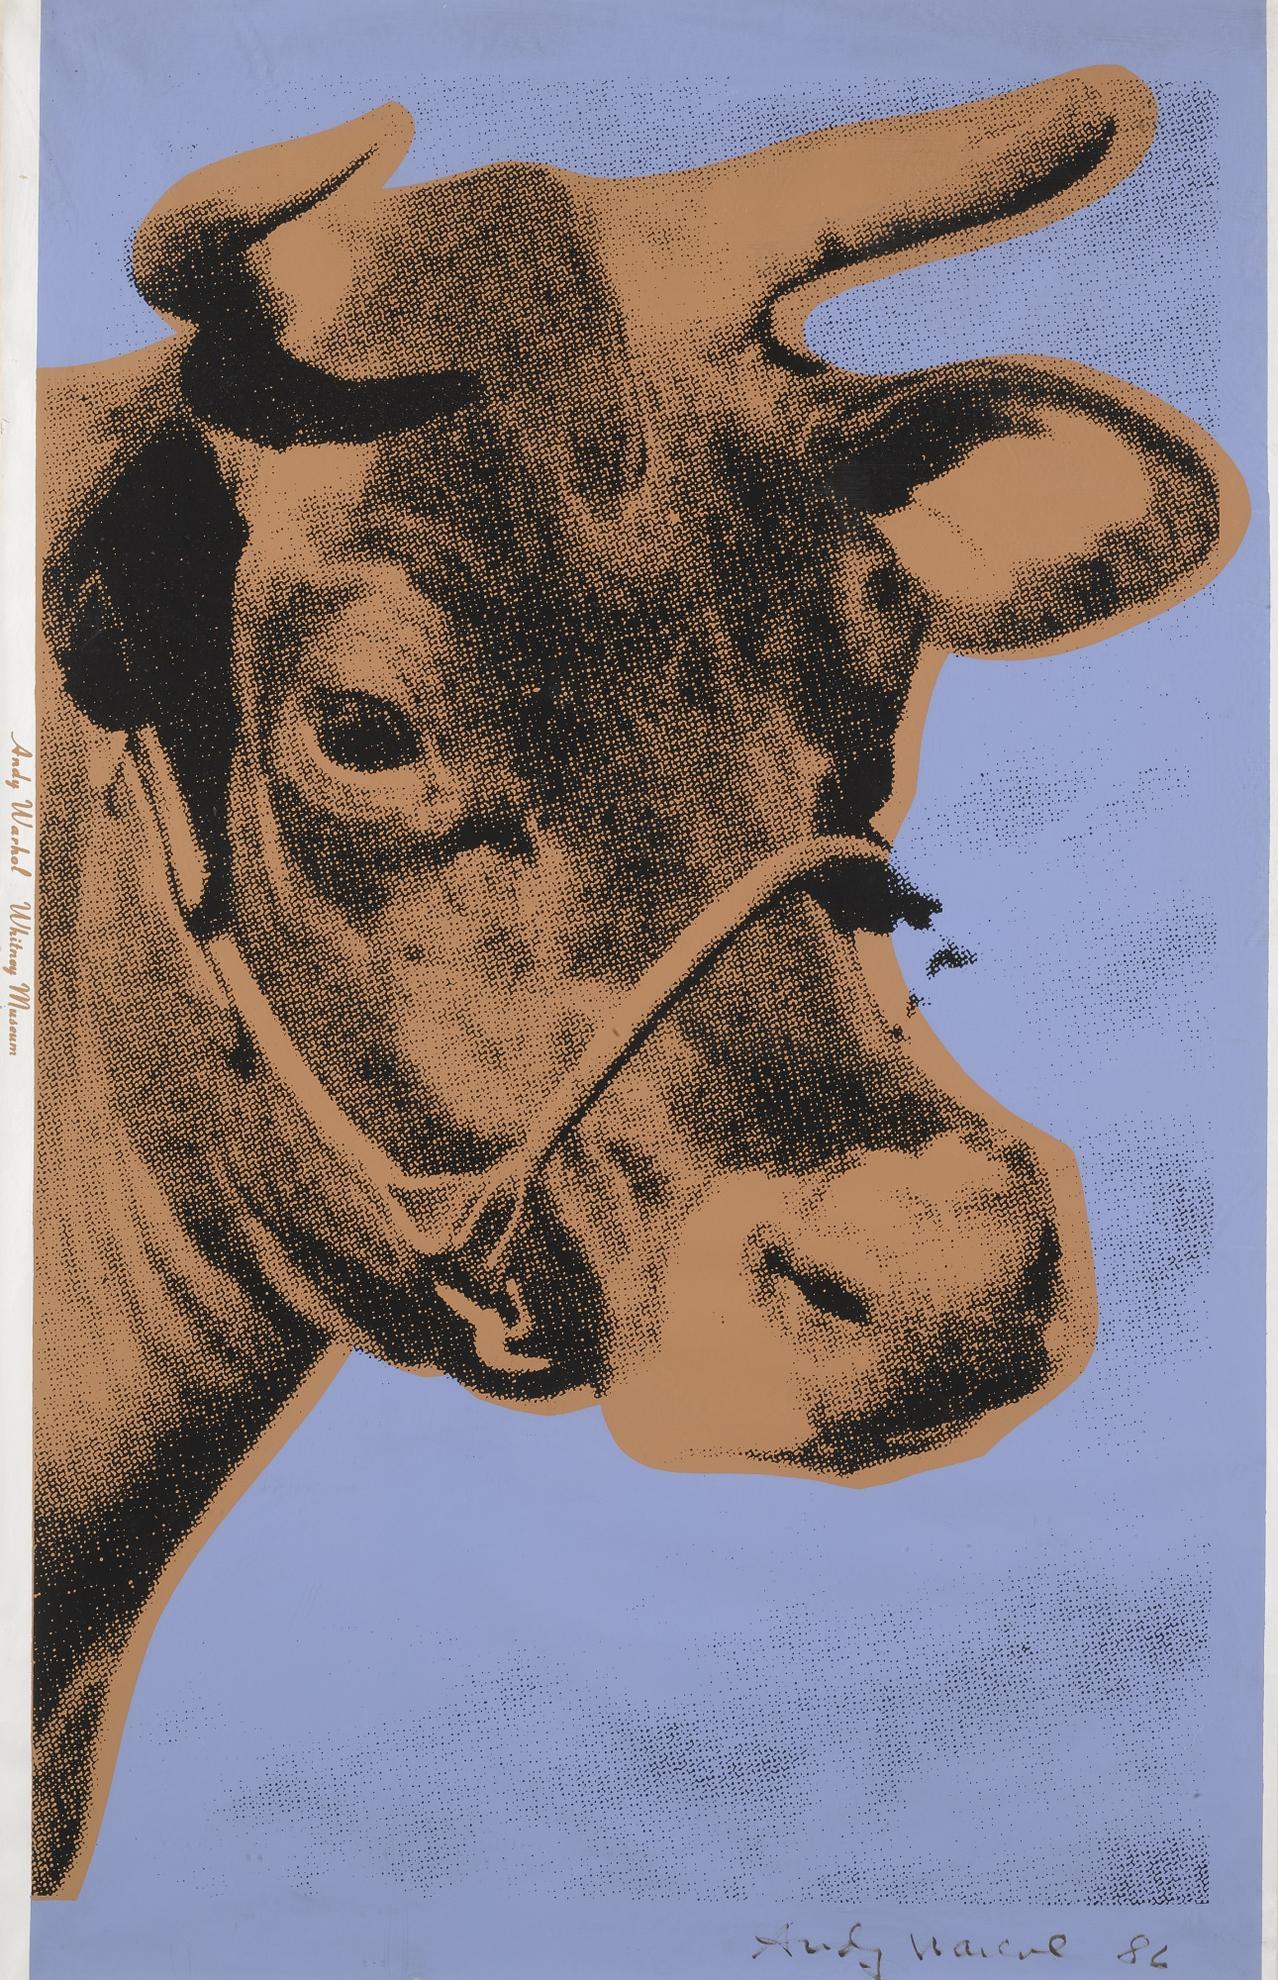 Andy Warhol-Cow (F. & S. Ii.11A)-1971